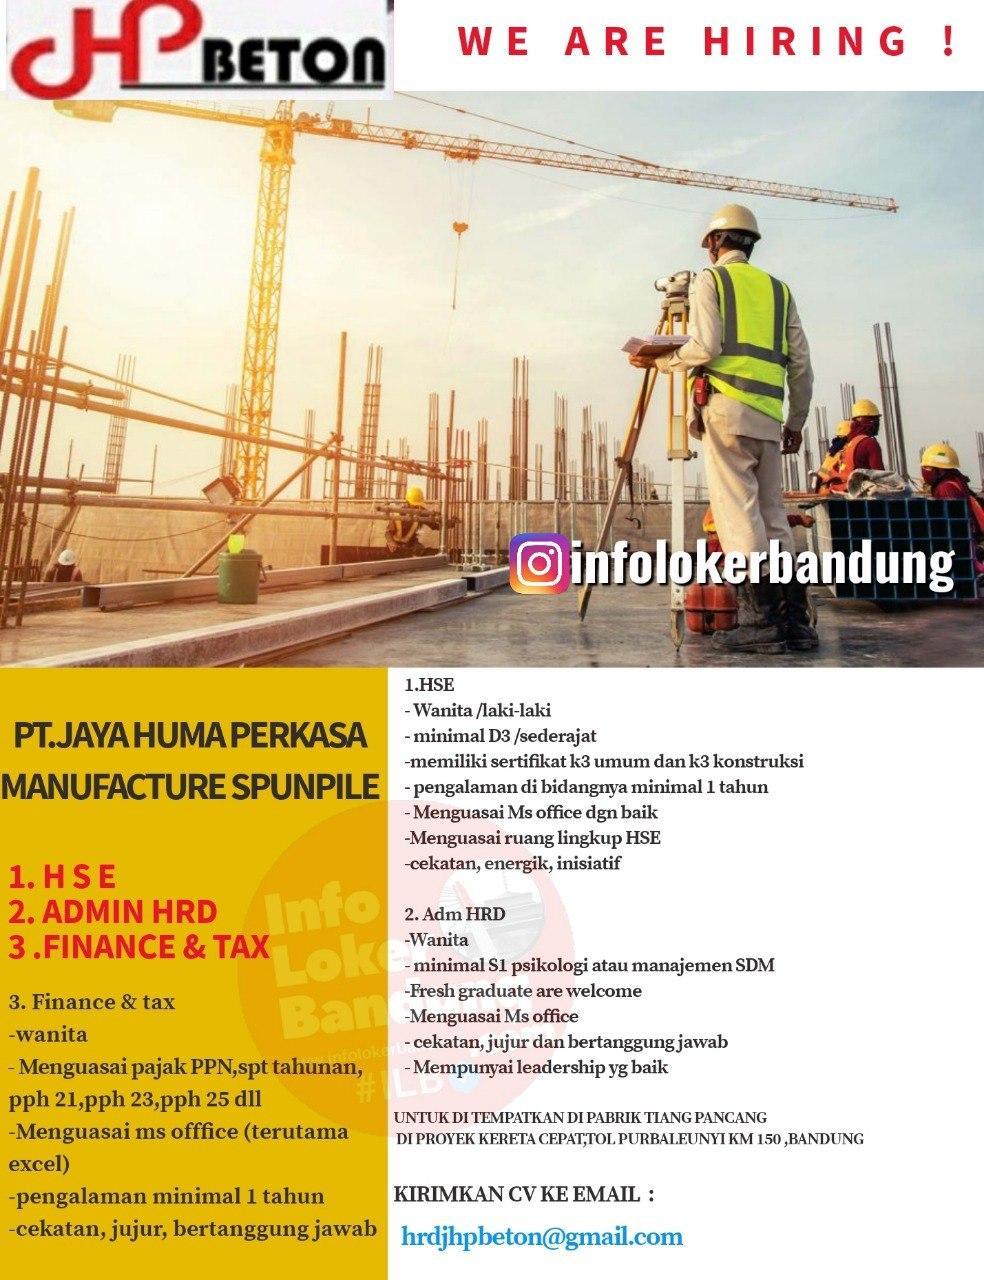 Lowongan Kerja HSE, Admin HRD, Finance & Tax JHP Beton Bandung Juli 2020